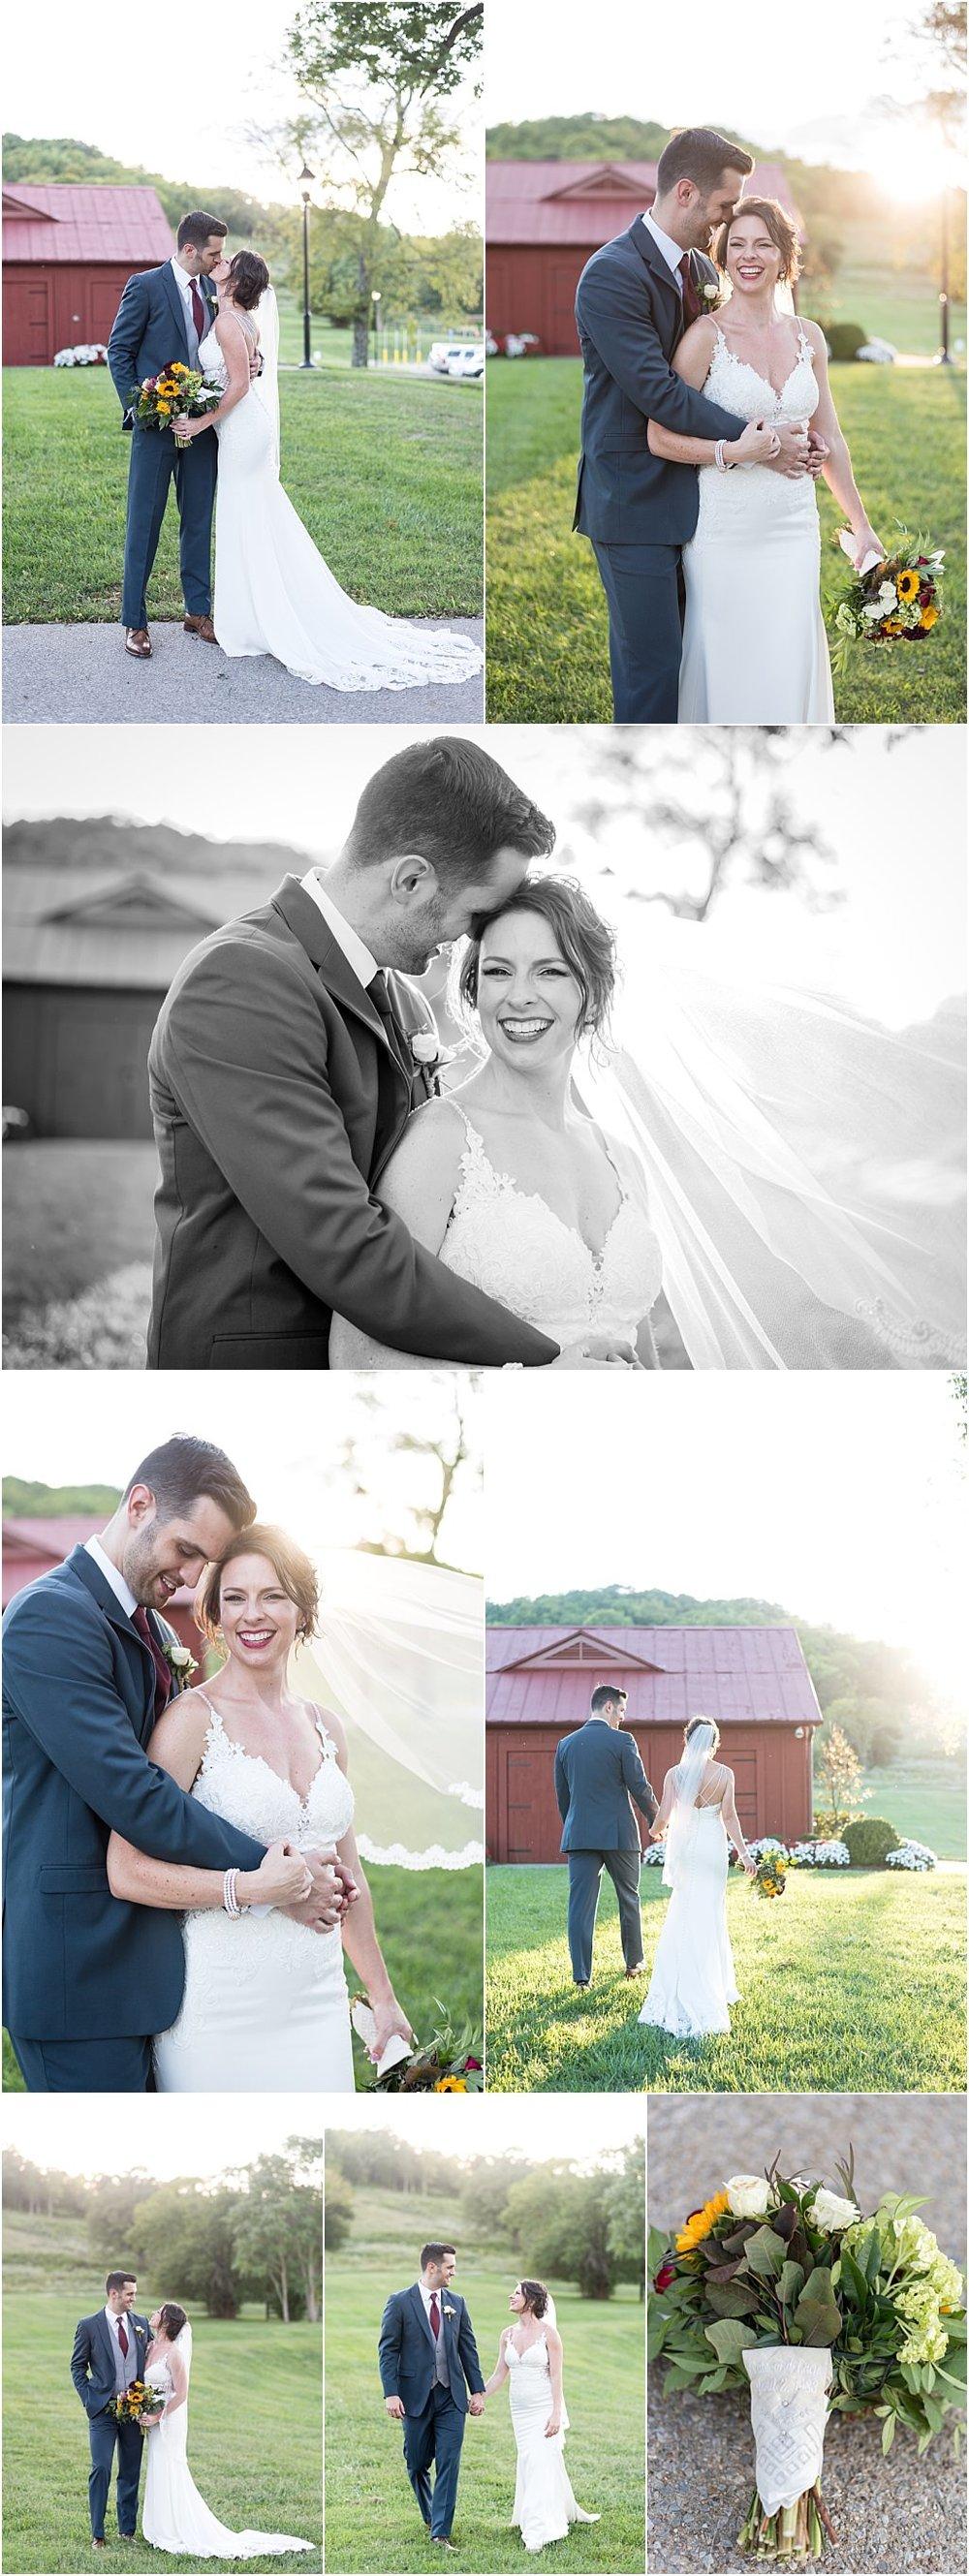 Jordan-and-Anna-Ravenswood-Mansion-Wedding-in-Brentwood-TN-Nashville-Wedding-Photographers+8